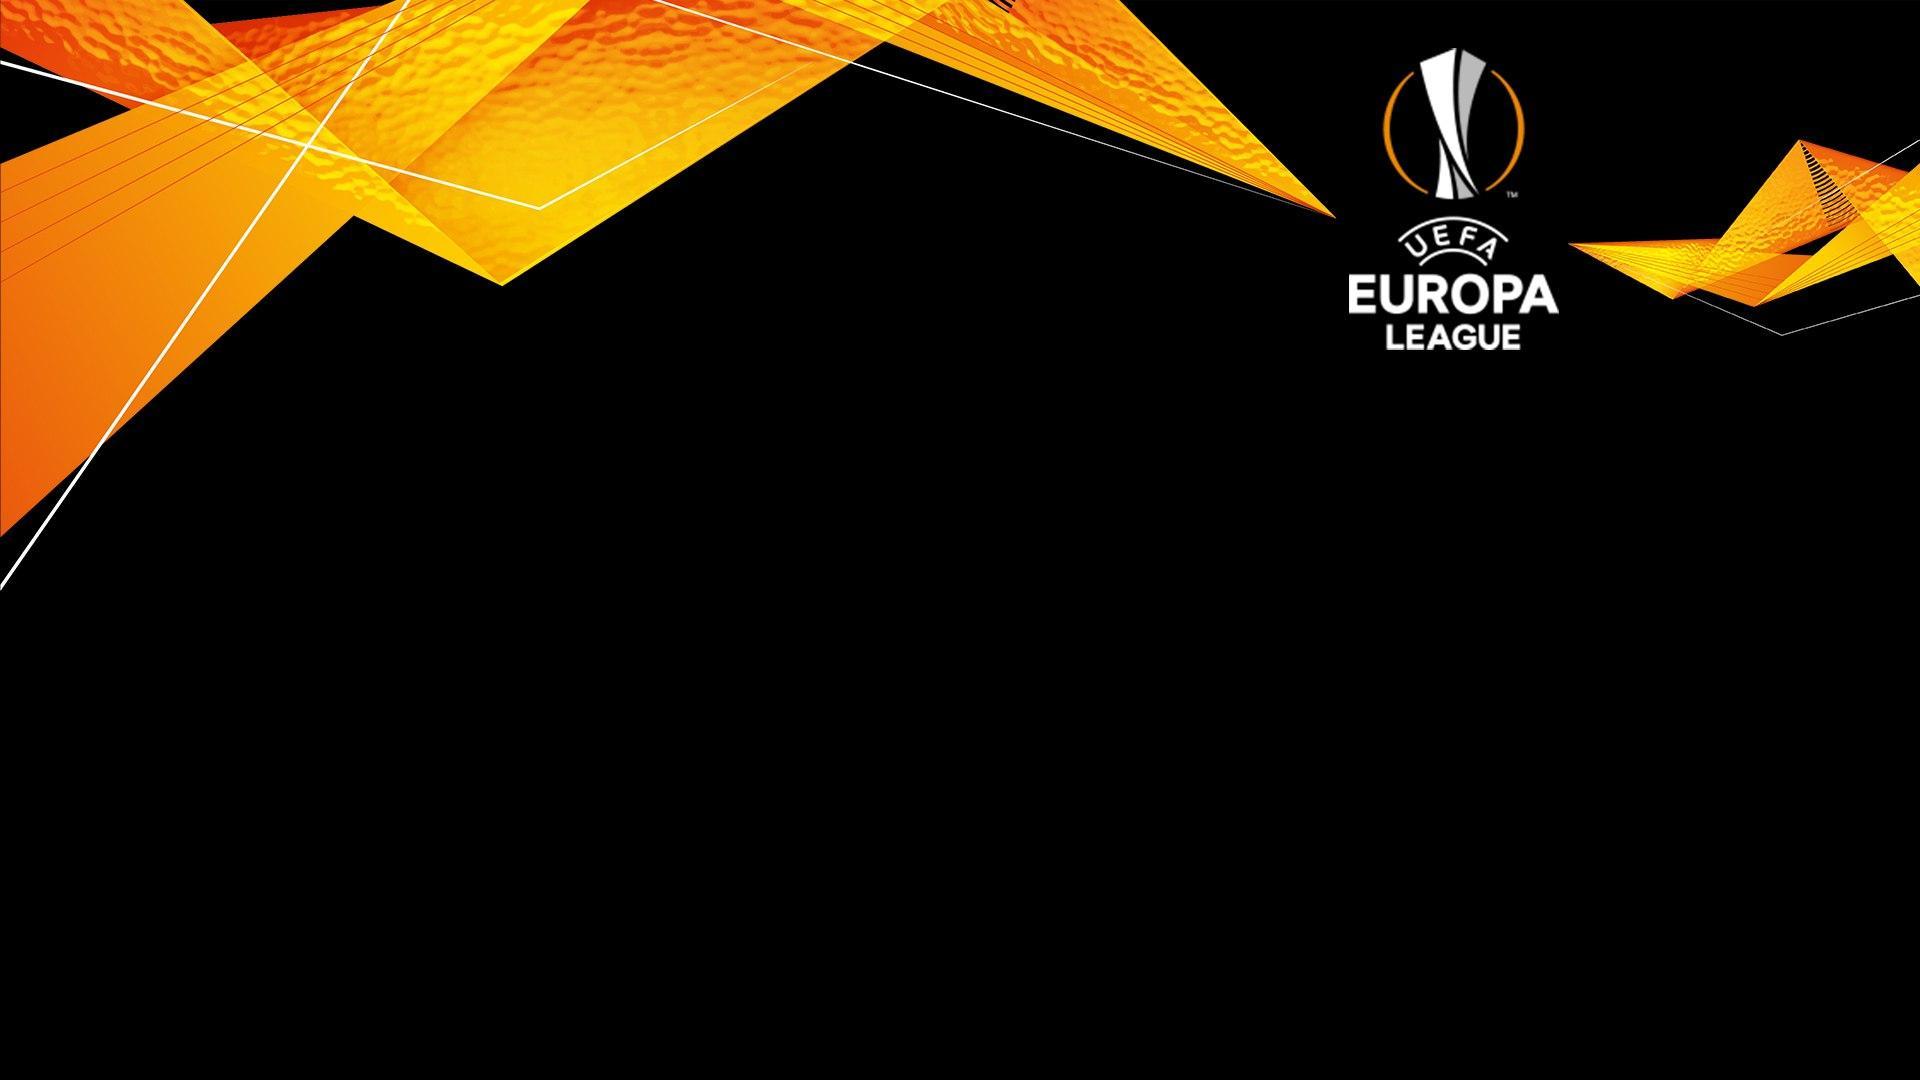 Sky Sport America's Cup HD UEFA Europa League Preview